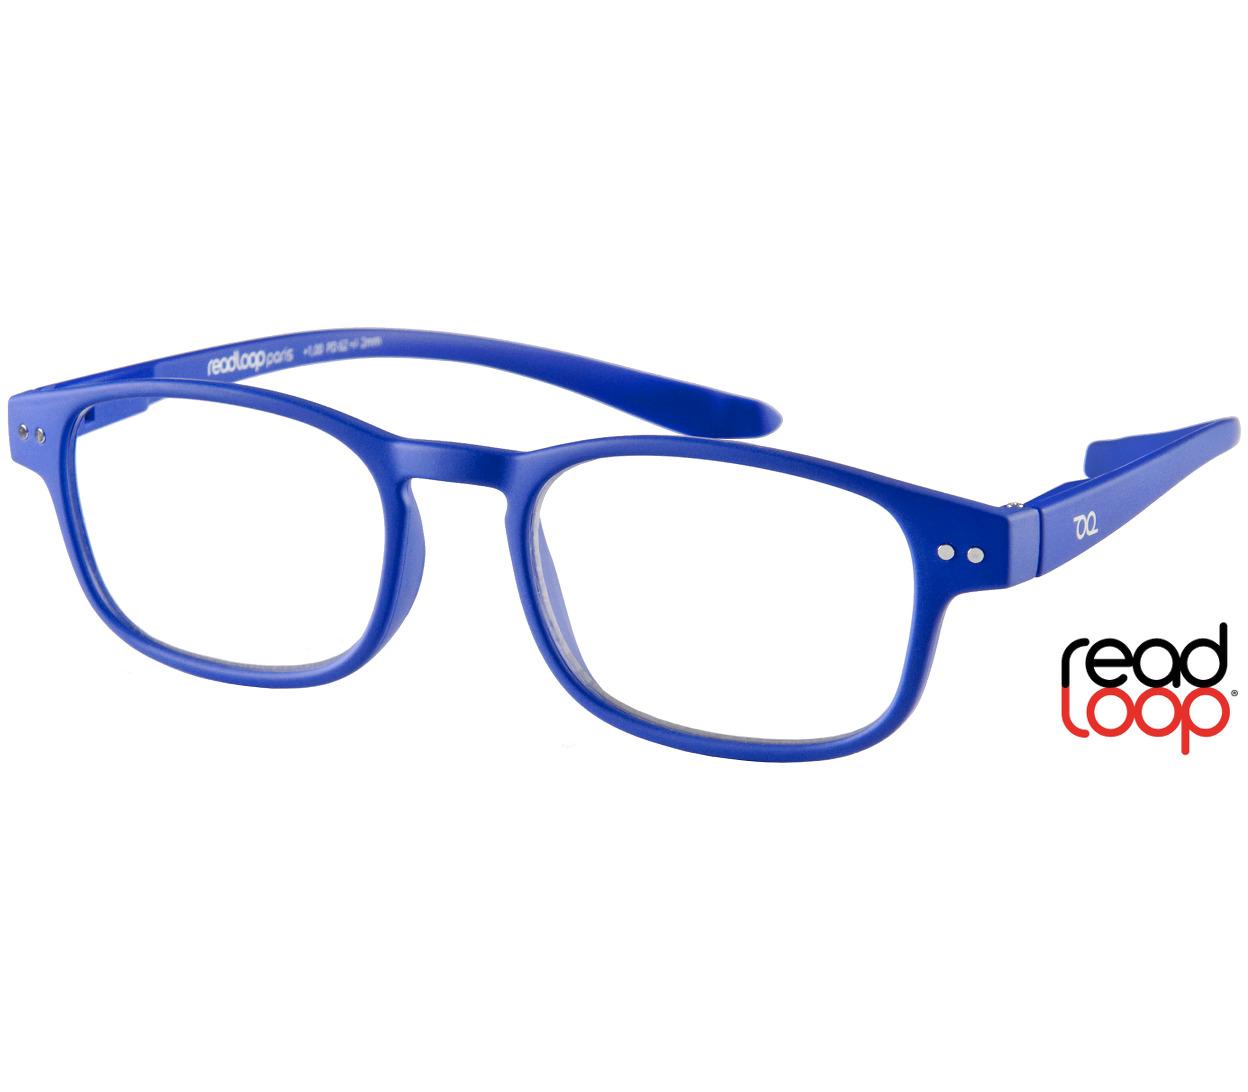 Main Image (Angle) - Manta (Blue) Classic Reading Glasses